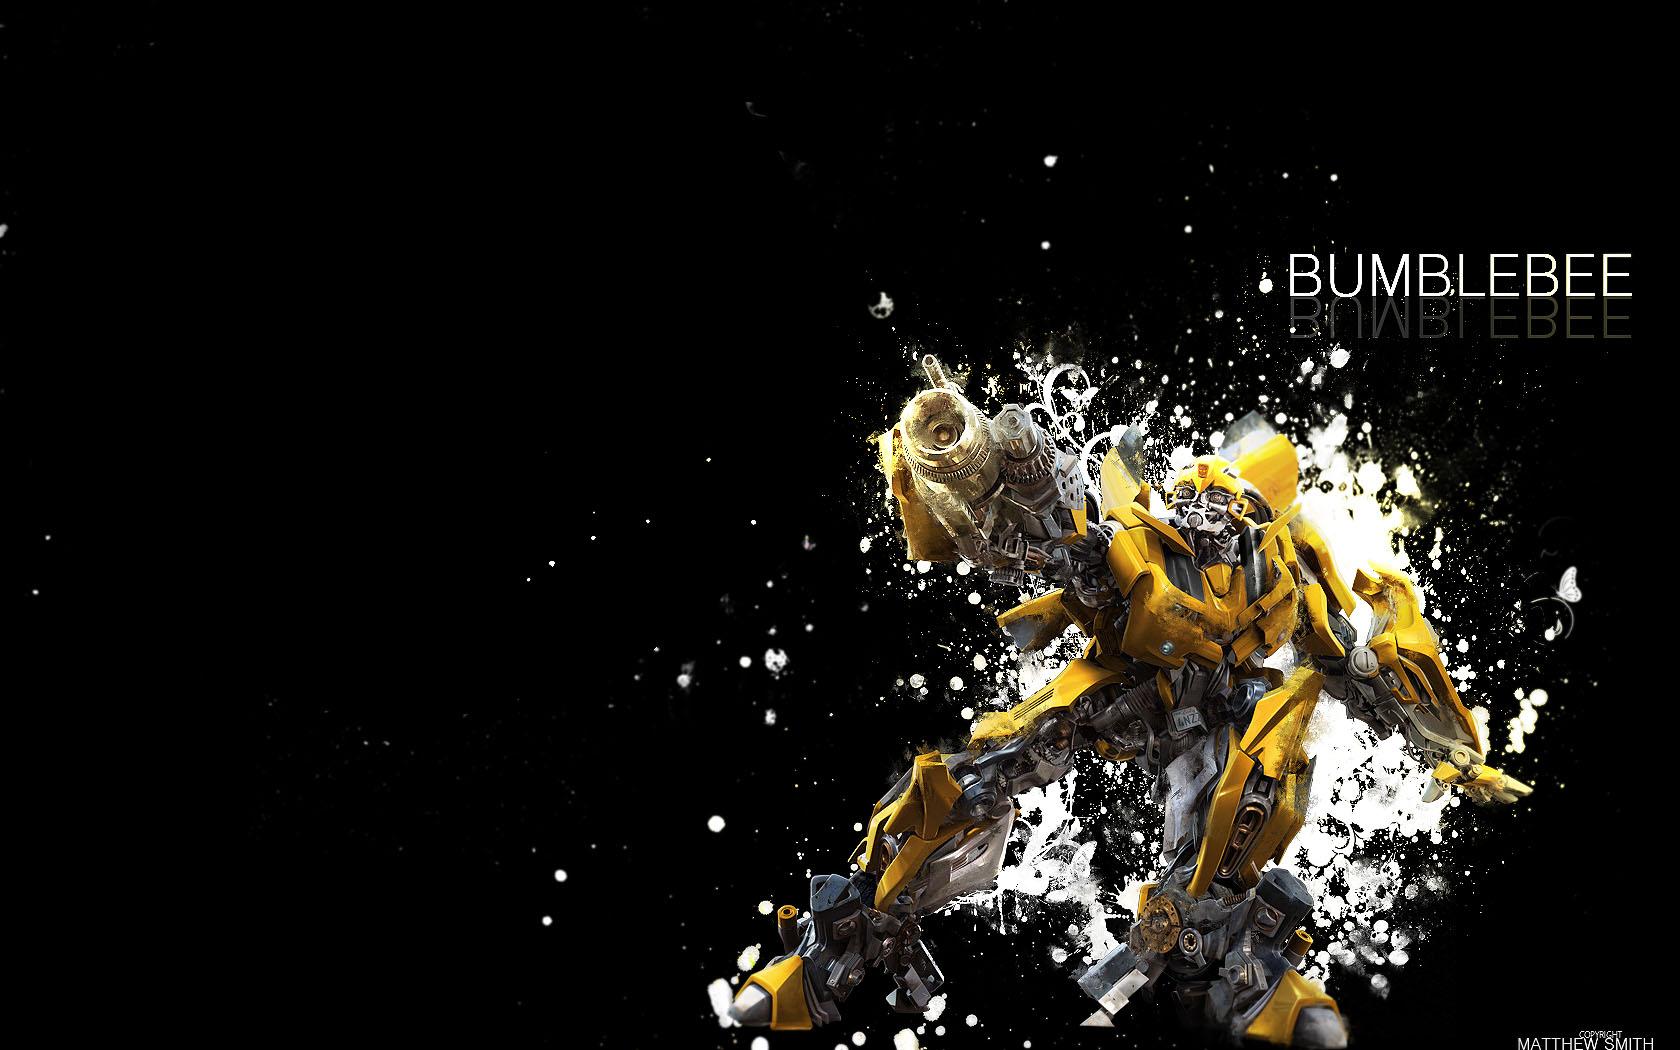 BumbleBee Wallpaper 2 1680x050 by Unique2892 on deviantART 1680x1050